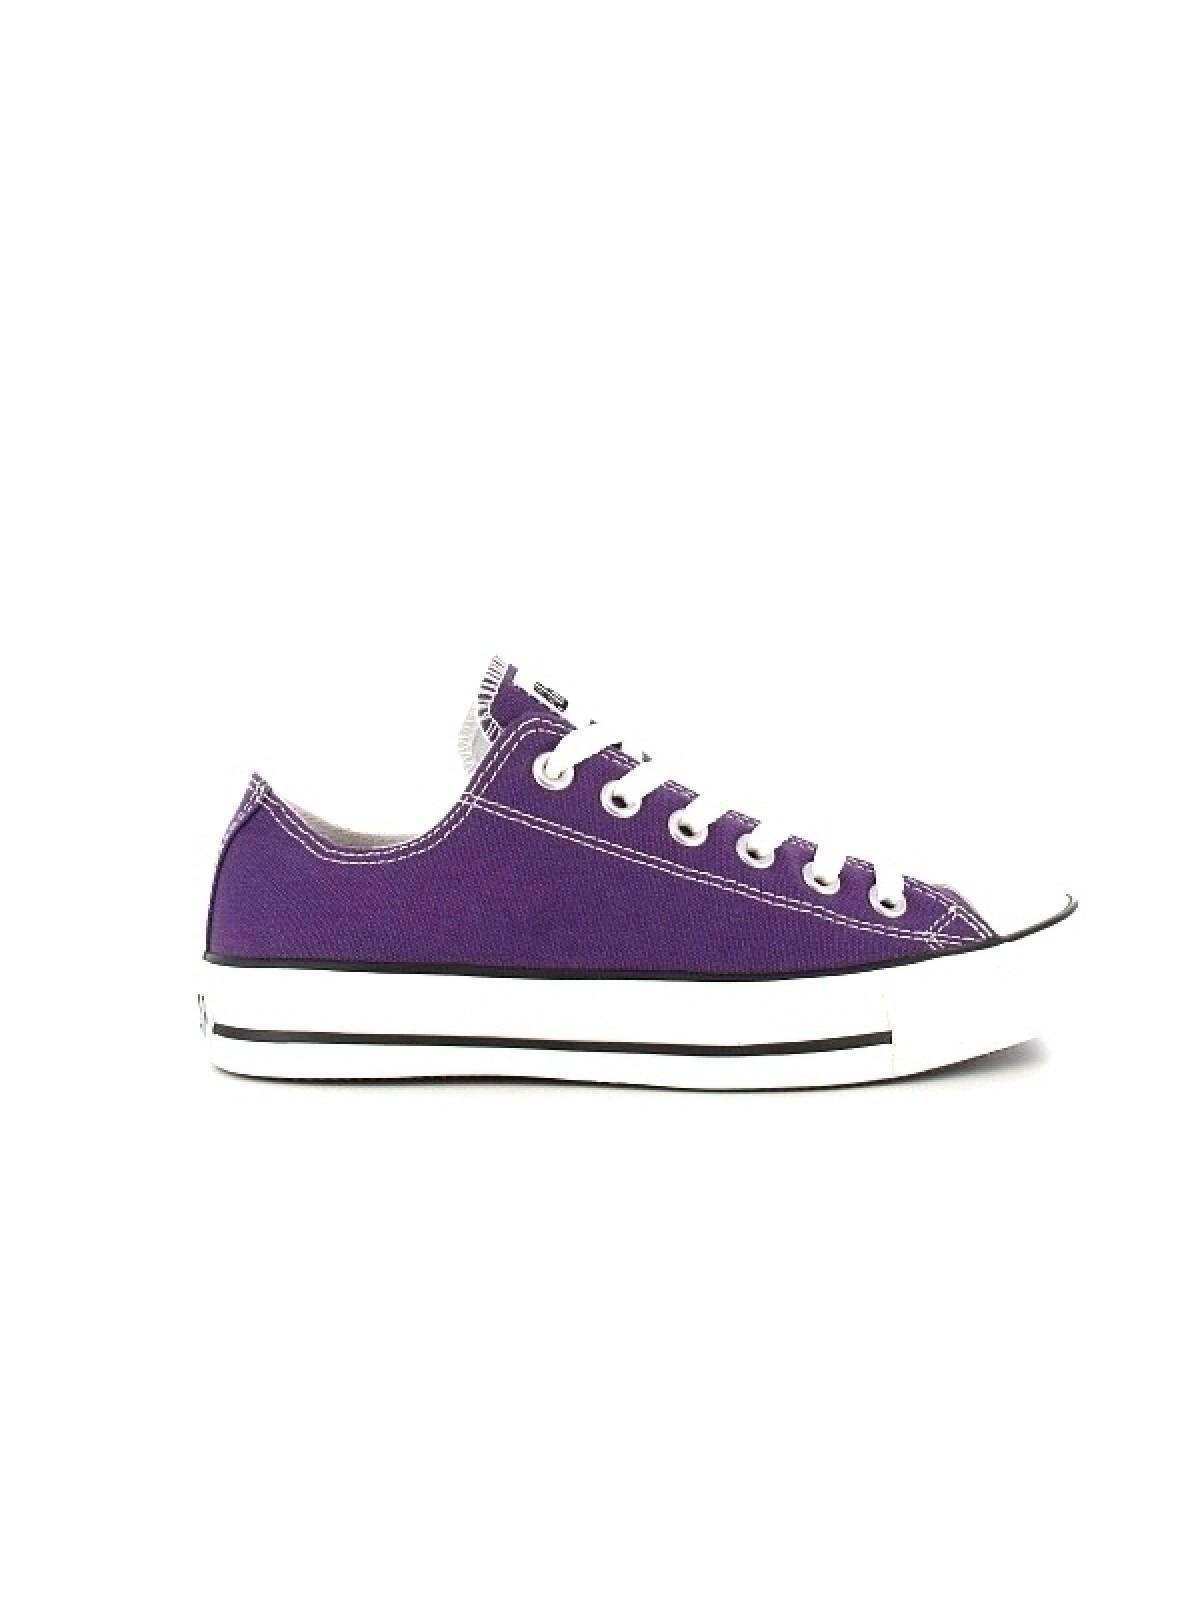 Converse Chuck Taylor all star toile basse purple